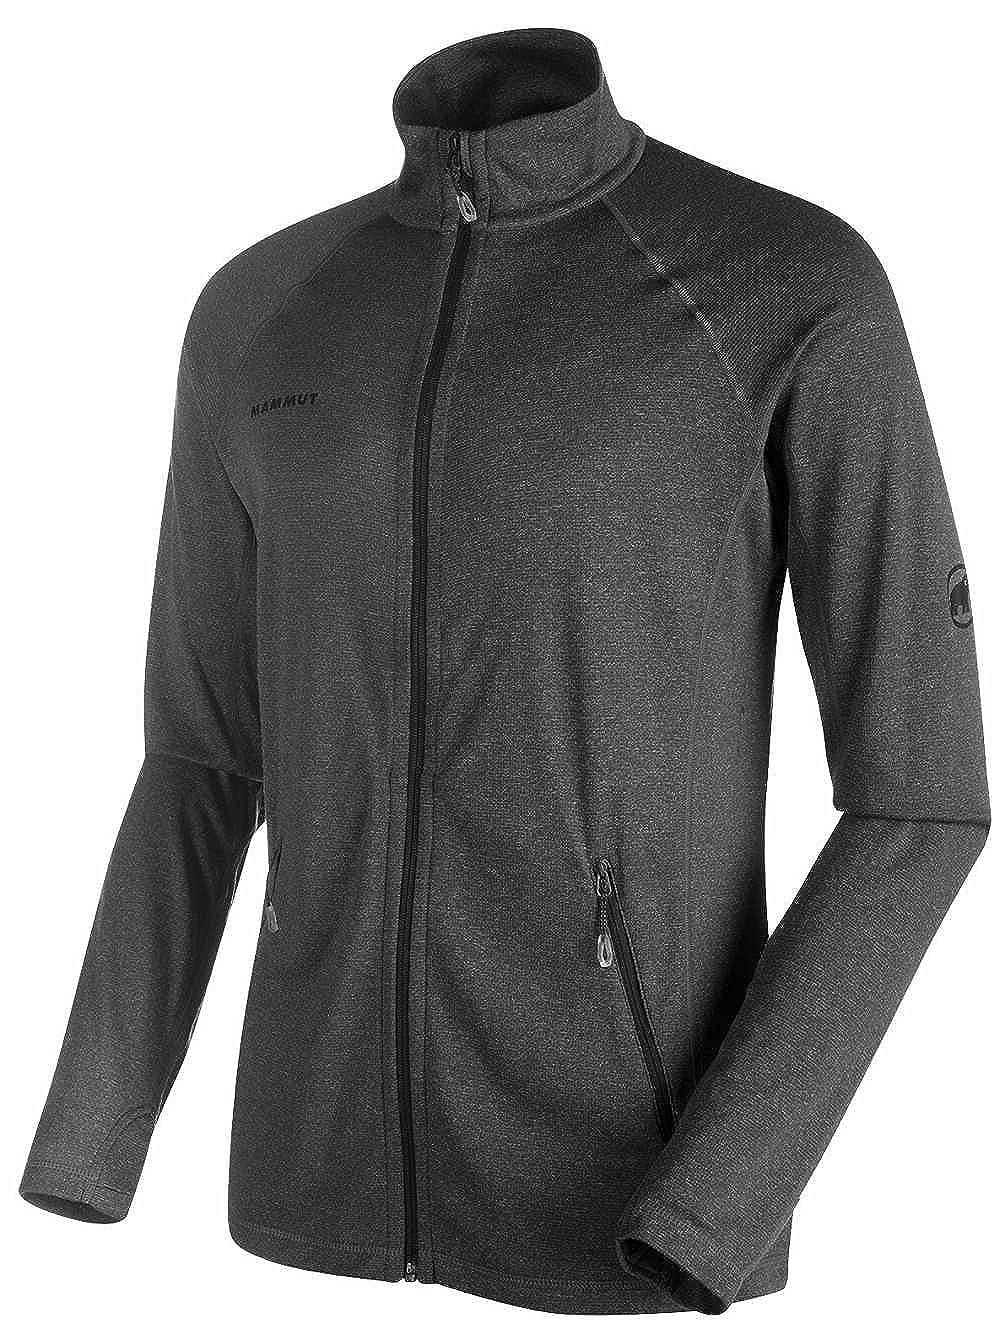 Mammut Runbold Light ML Jacket graphite m/élange M